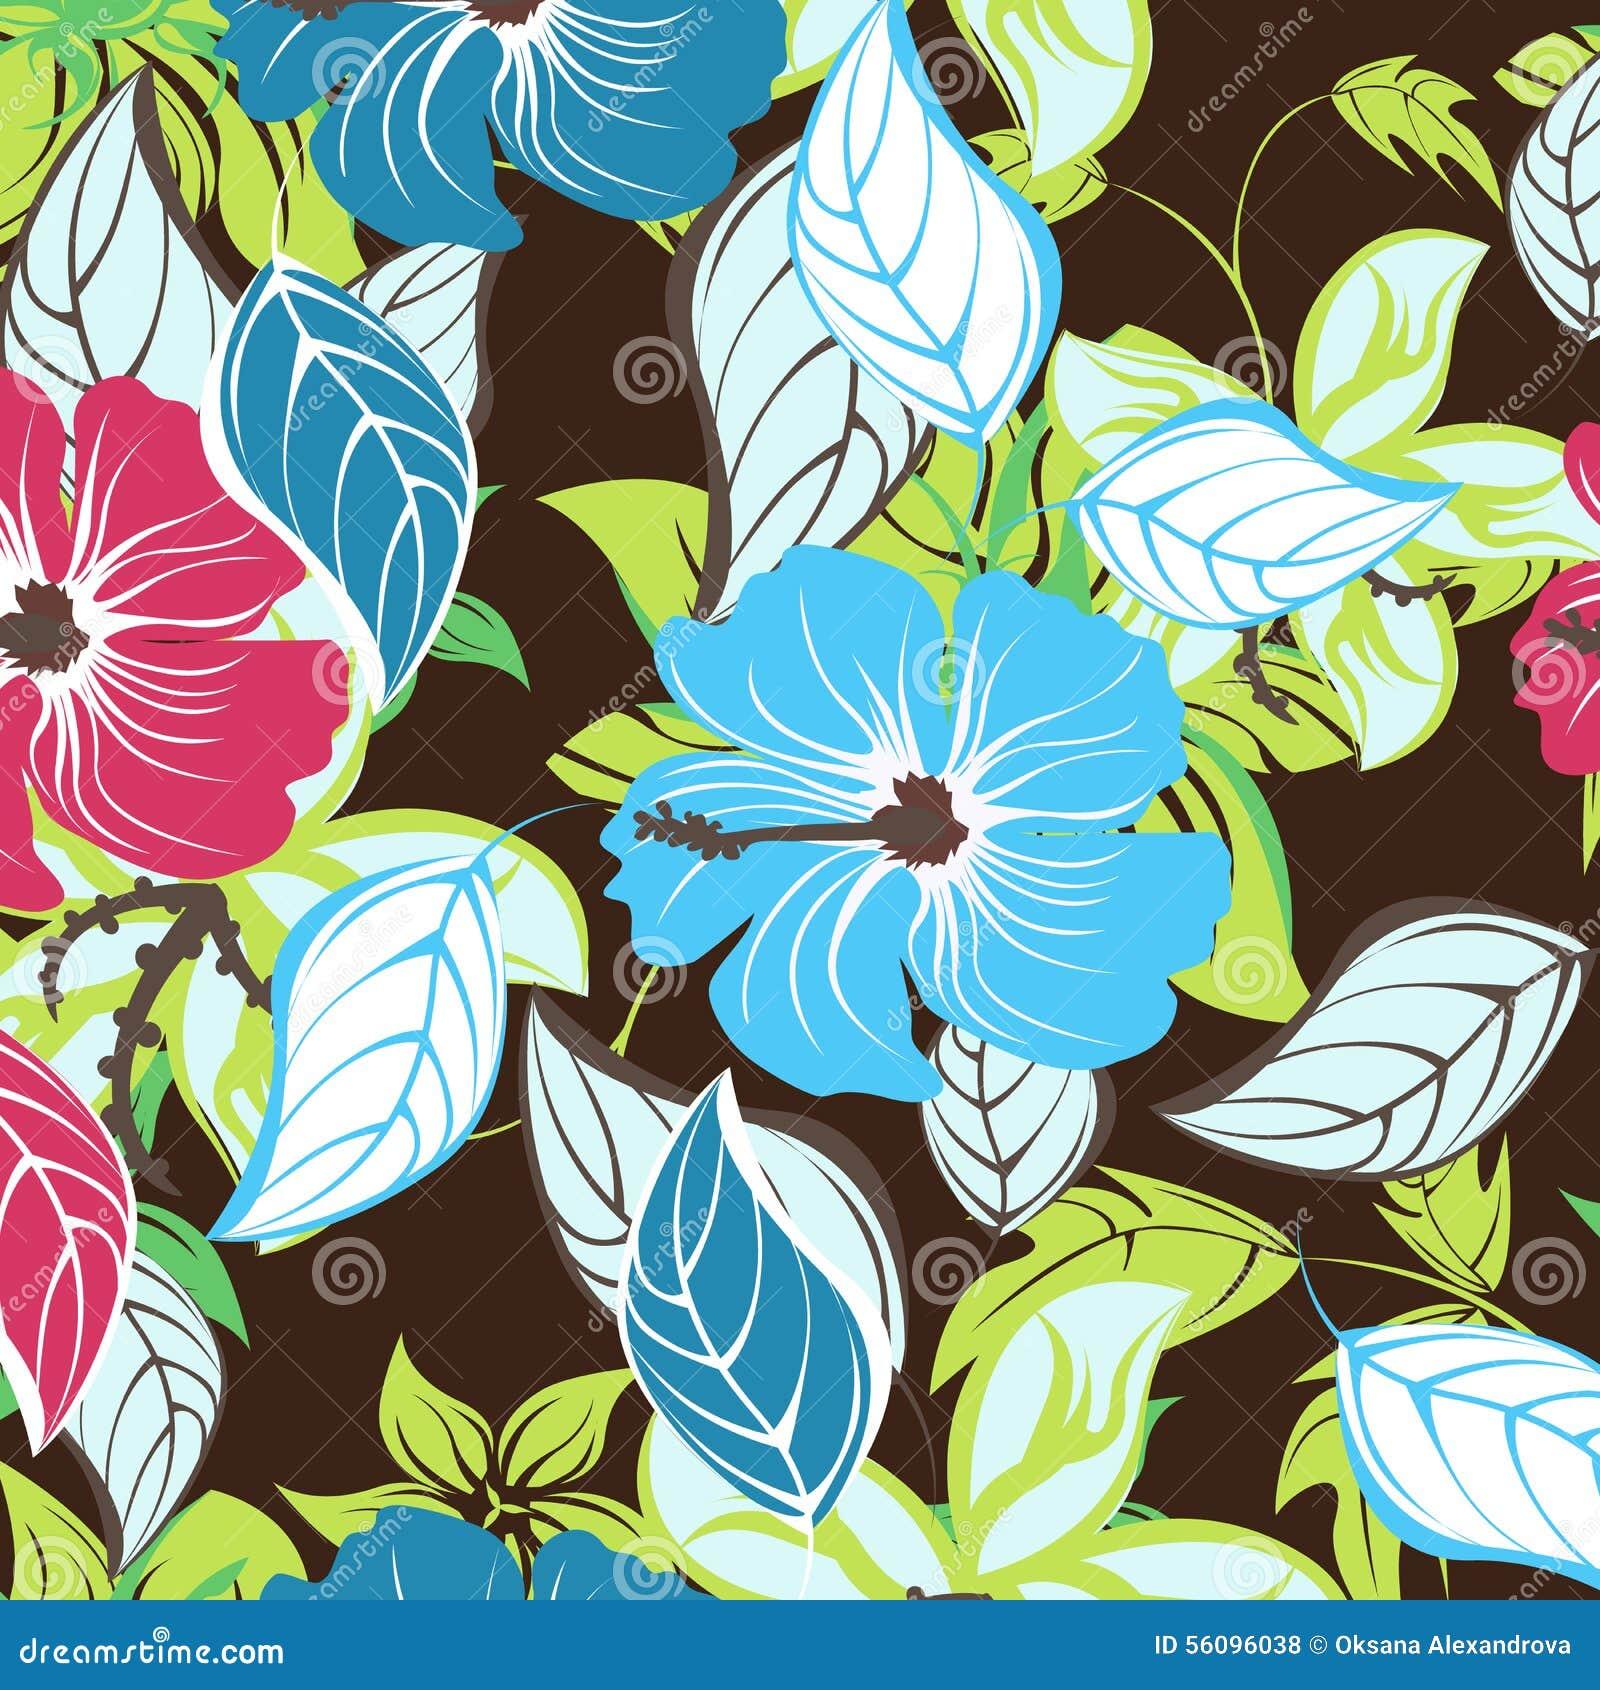 Seamless spring flower illustration stock vector illustration of download seamless spring flower illustration stock vector illustration of elegance outline 56096038 mightylinksfo